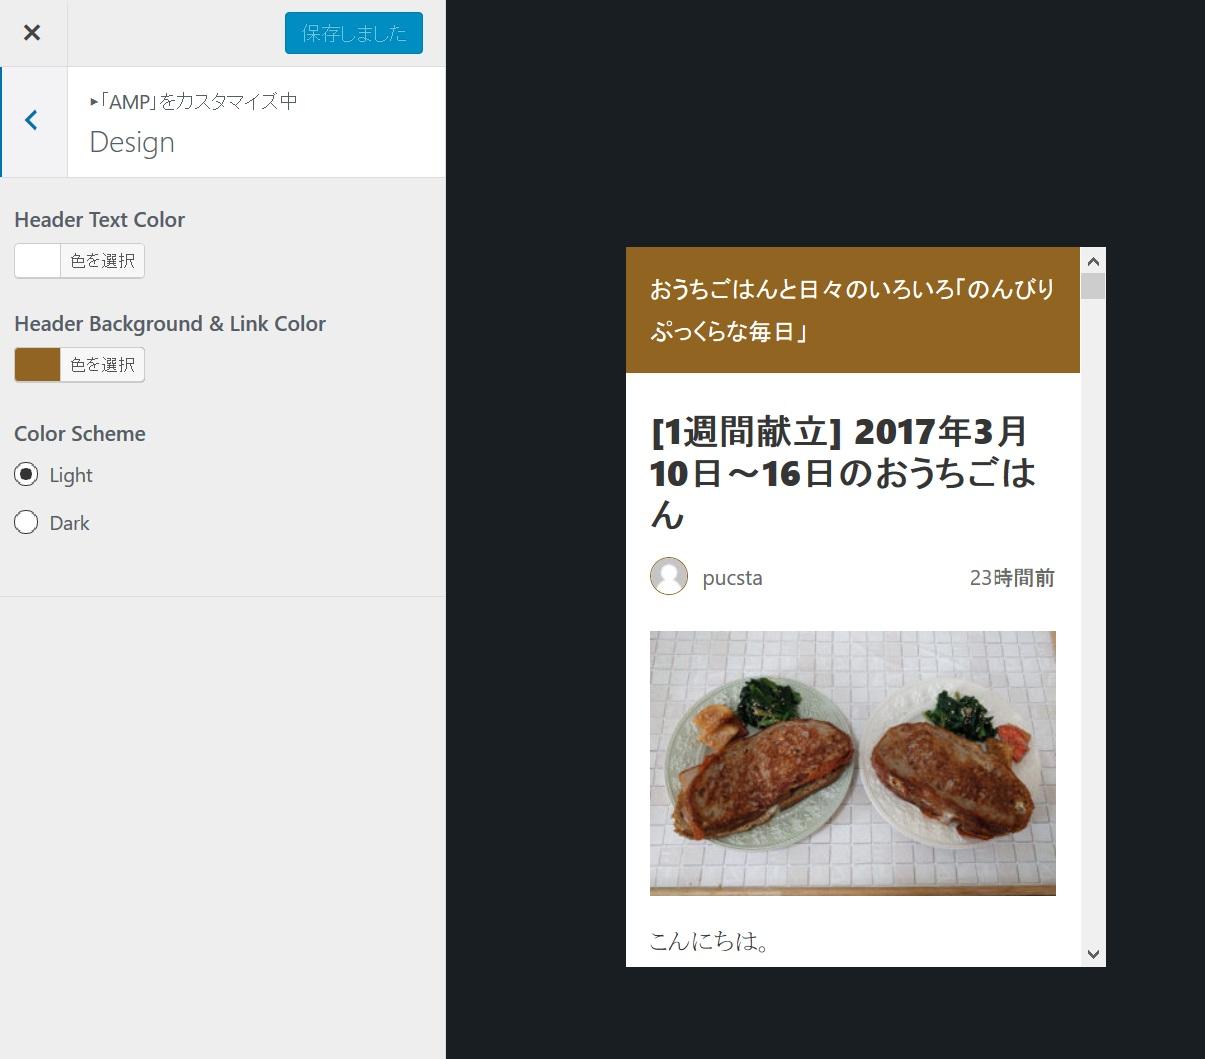 AMP対応プラグインカスタマイズ画面